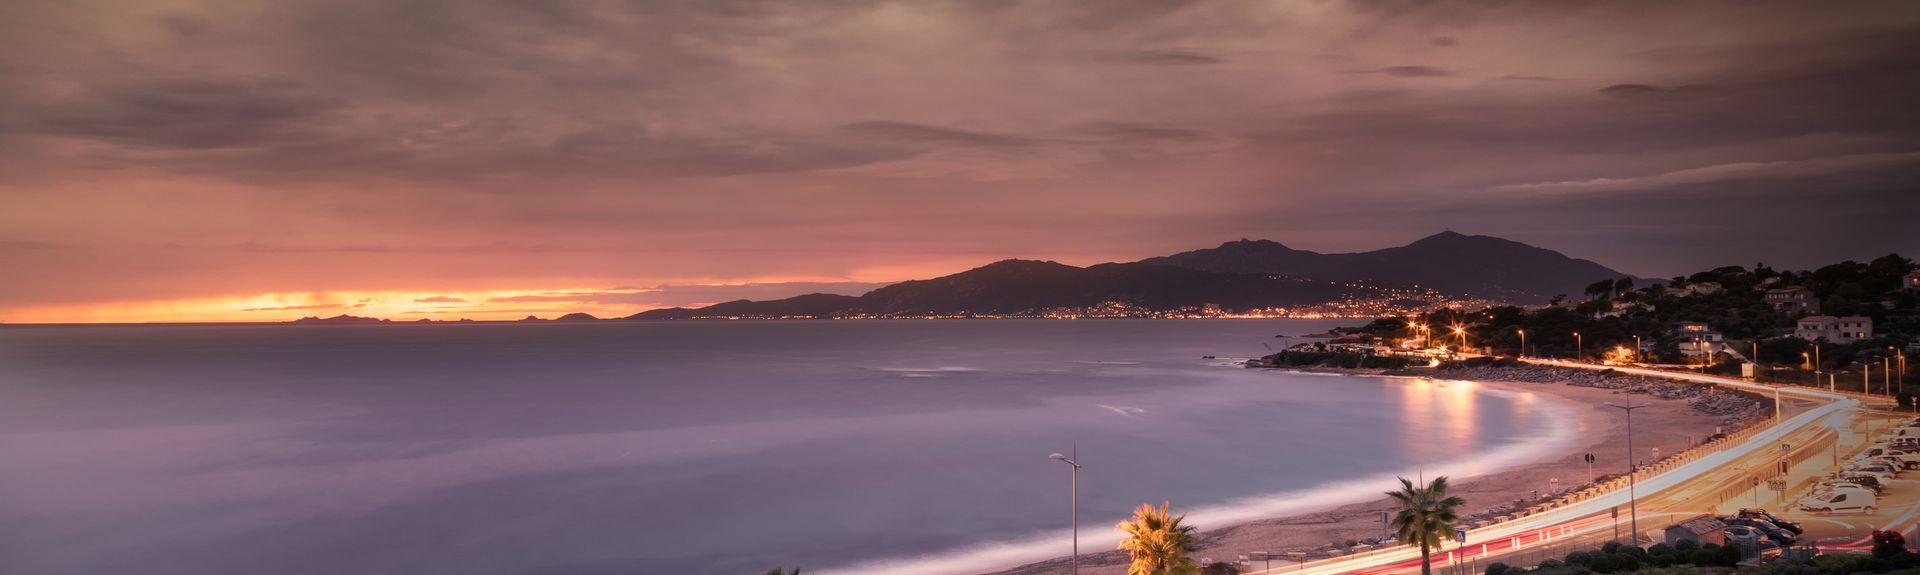 Porticcio, Grosseto-Prugna, Córcega del Sur, Francia